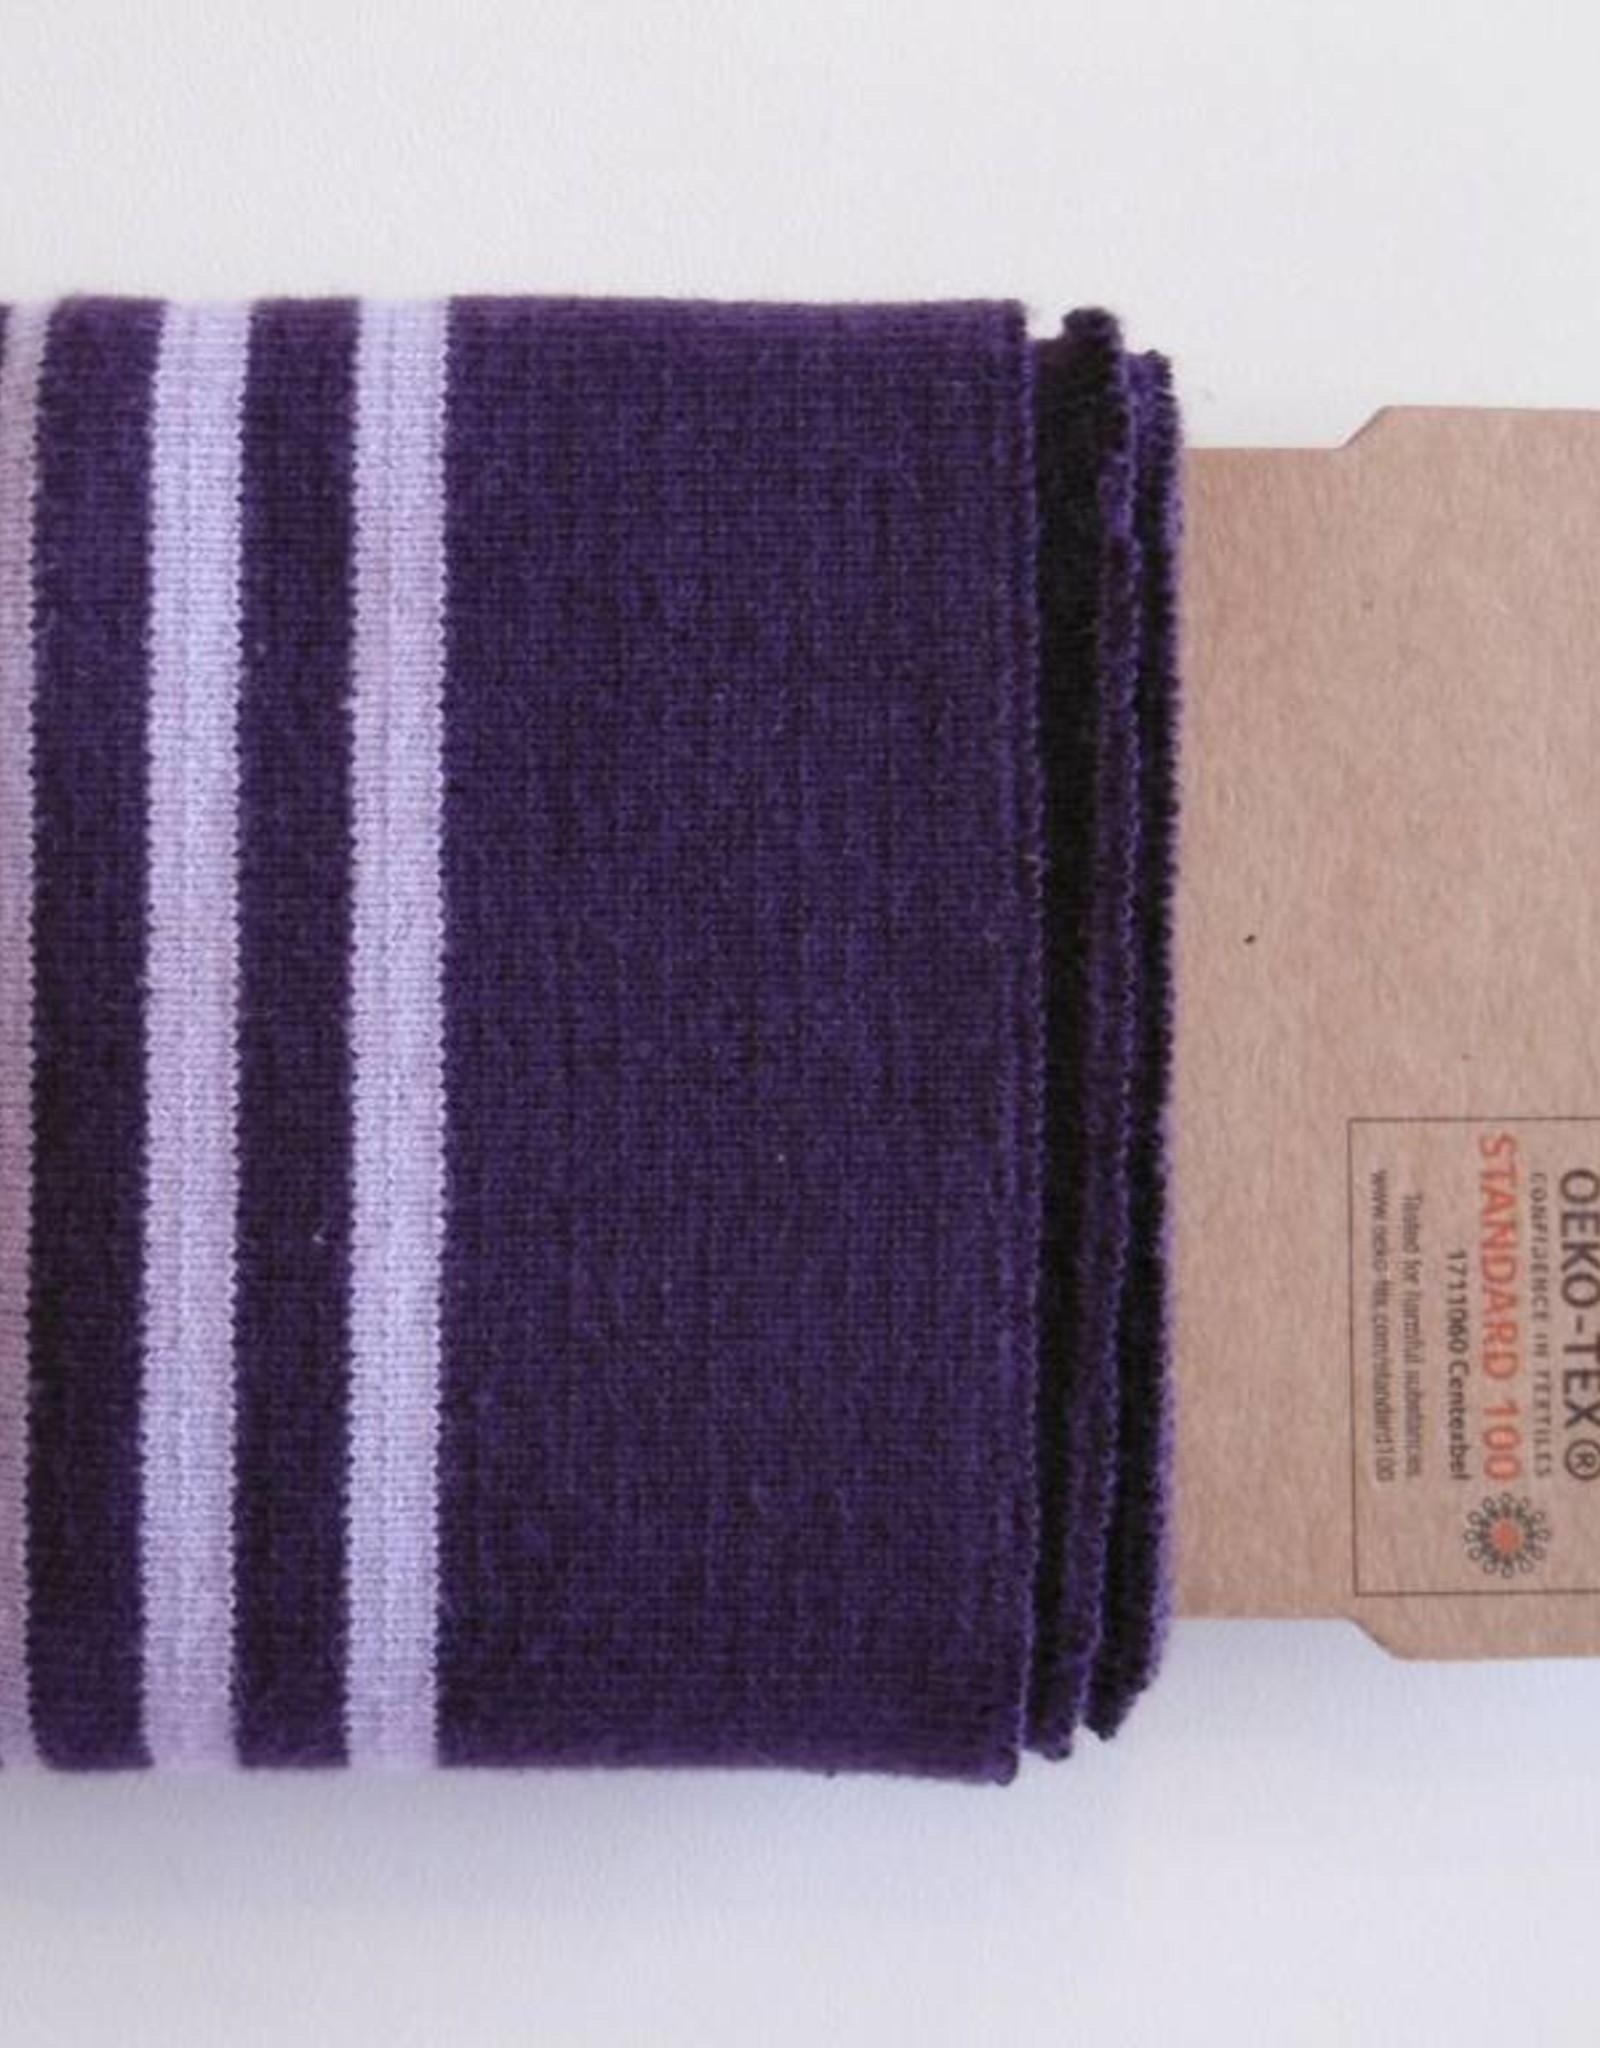 Cuffs strepen paars/lila 110*7cm